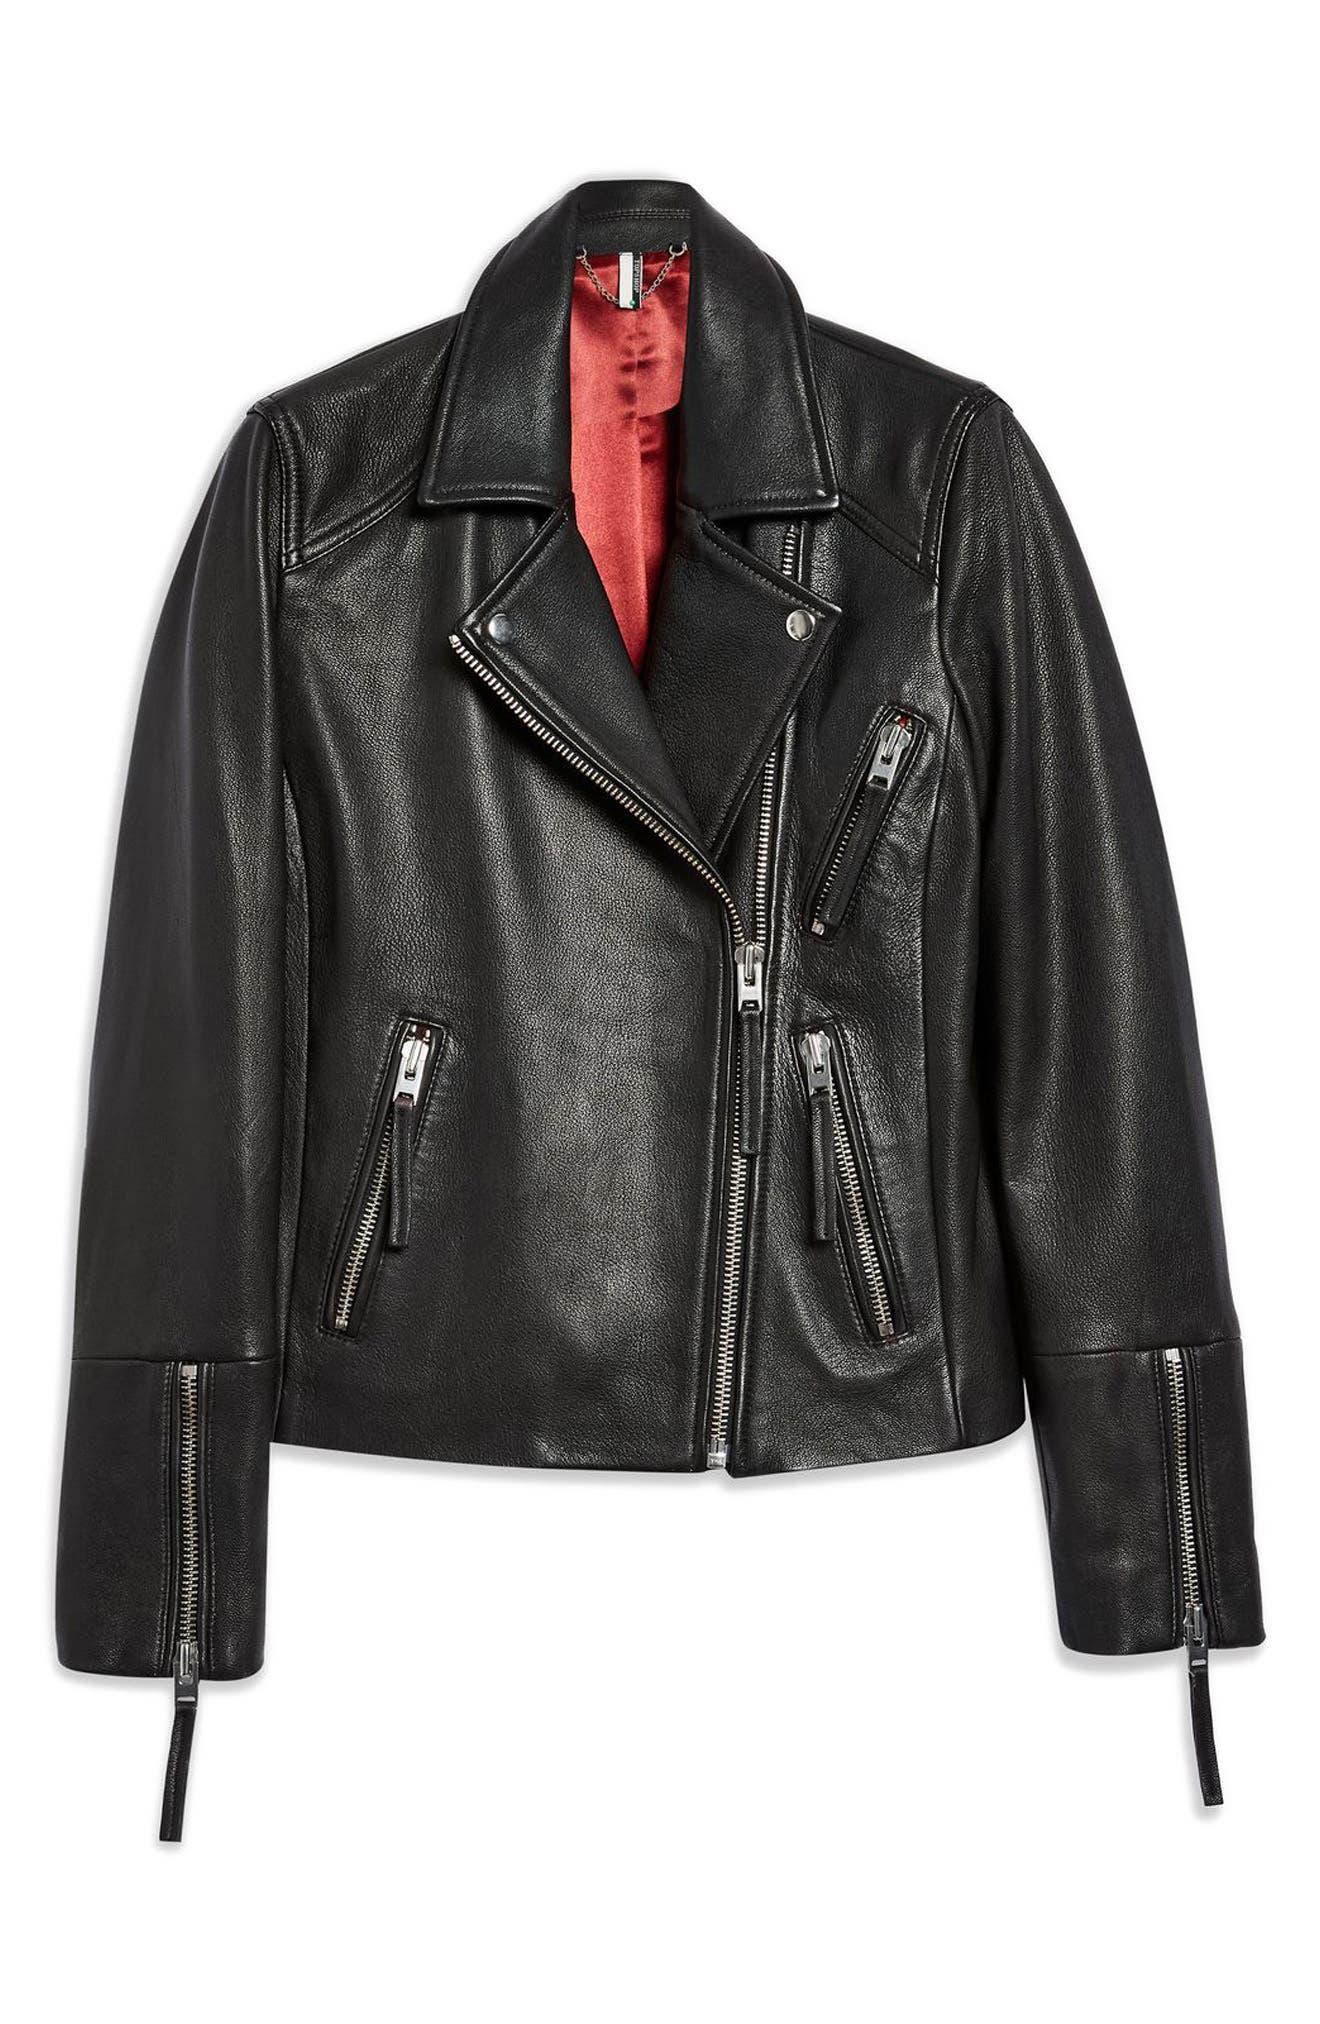 TOPSHOP, Dolly Leather Biker Jacket, Alternate thumbnail 5, color, BLACK